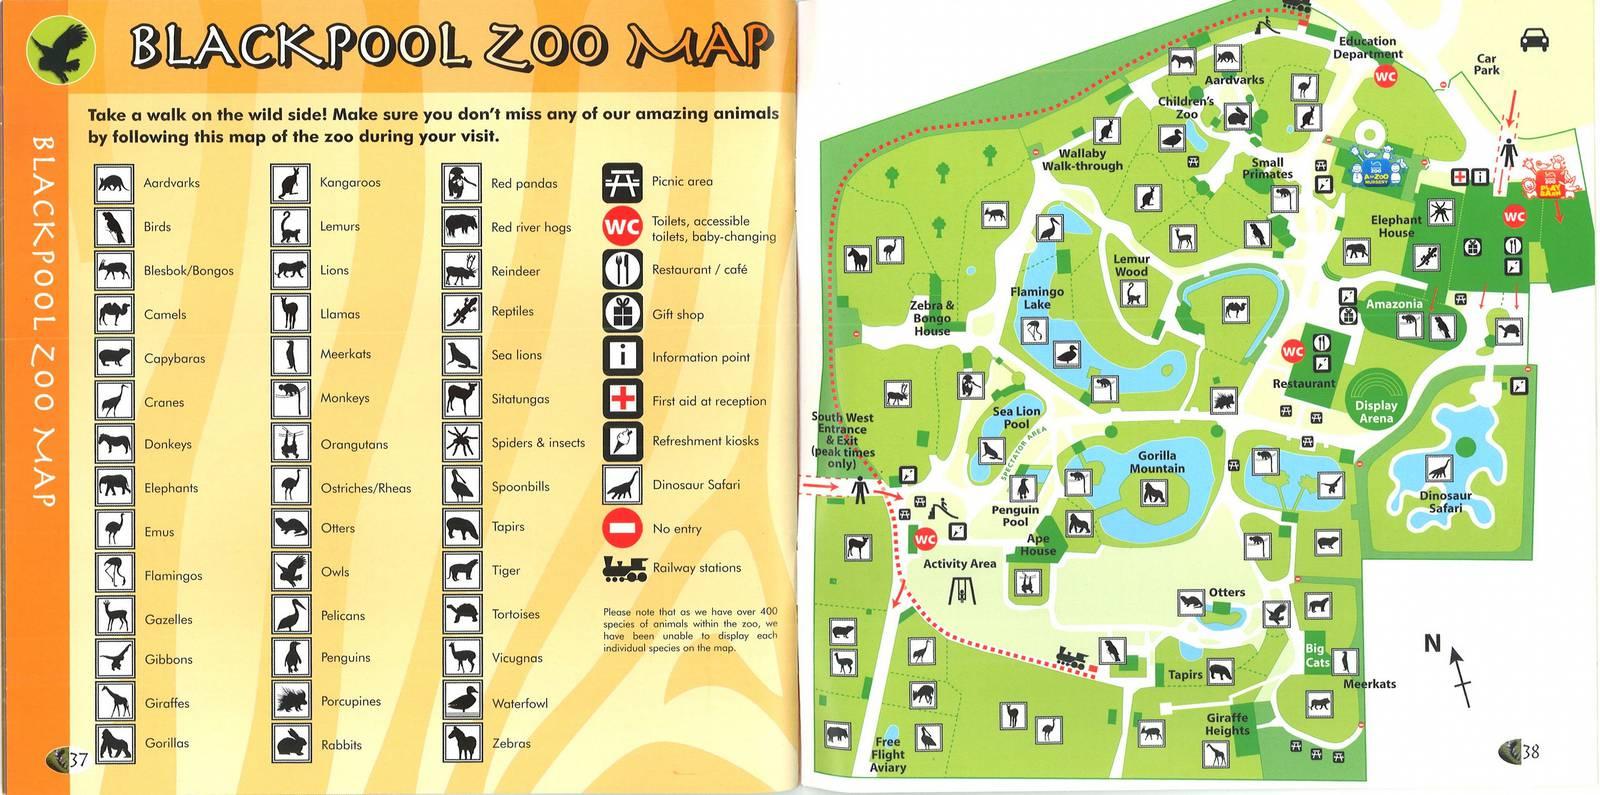 Zoos Blackpool Zoo